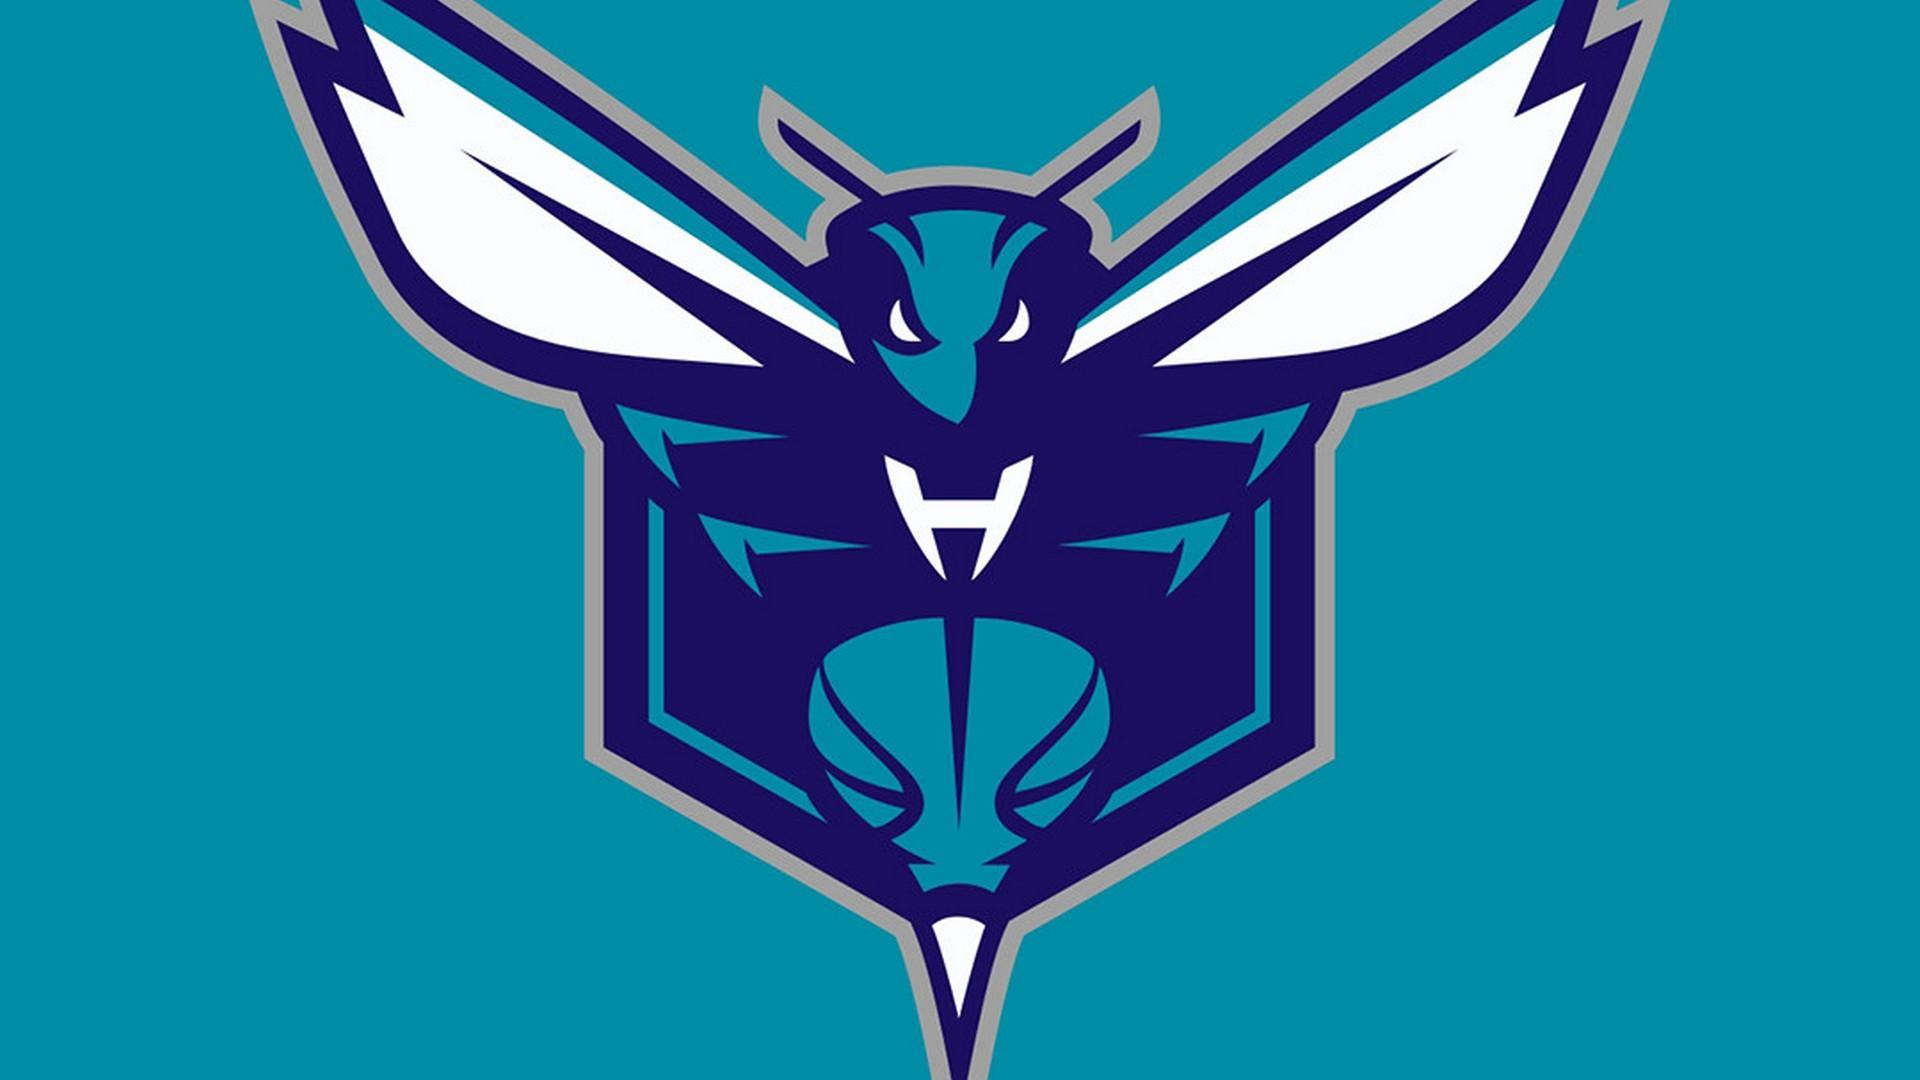 HD Charlotte Hornets Backgrounds 2019 Basketball Wallpaper 1920x1080